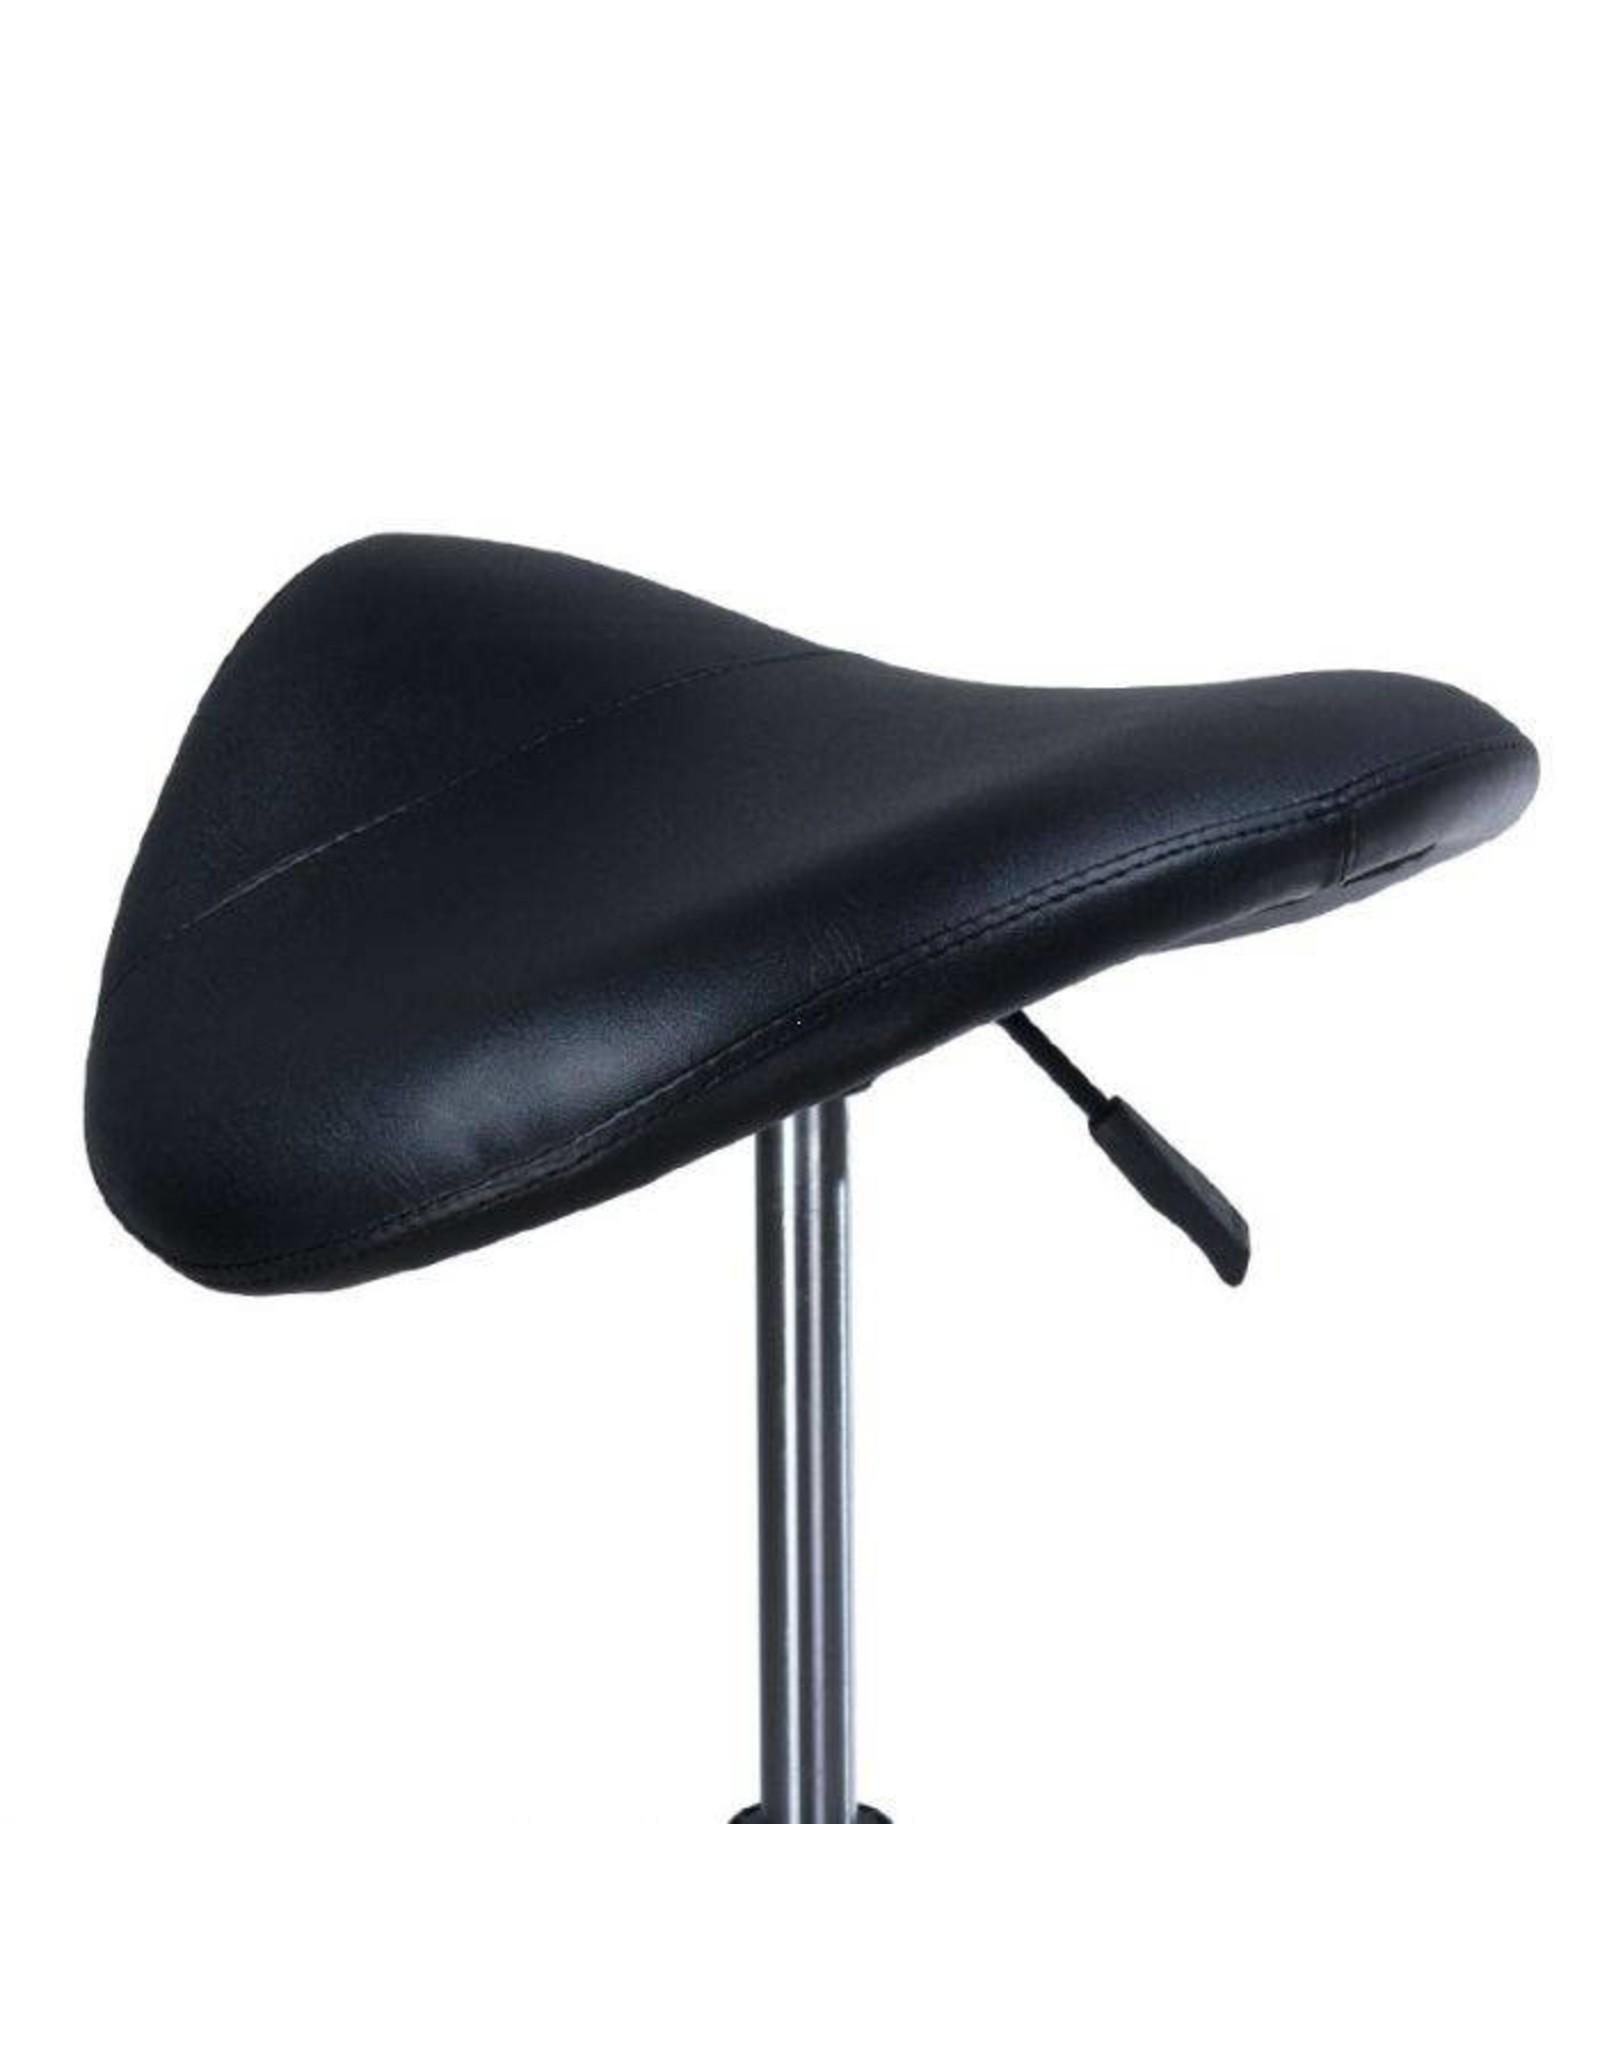 Merkloos Knipkruk - zwart